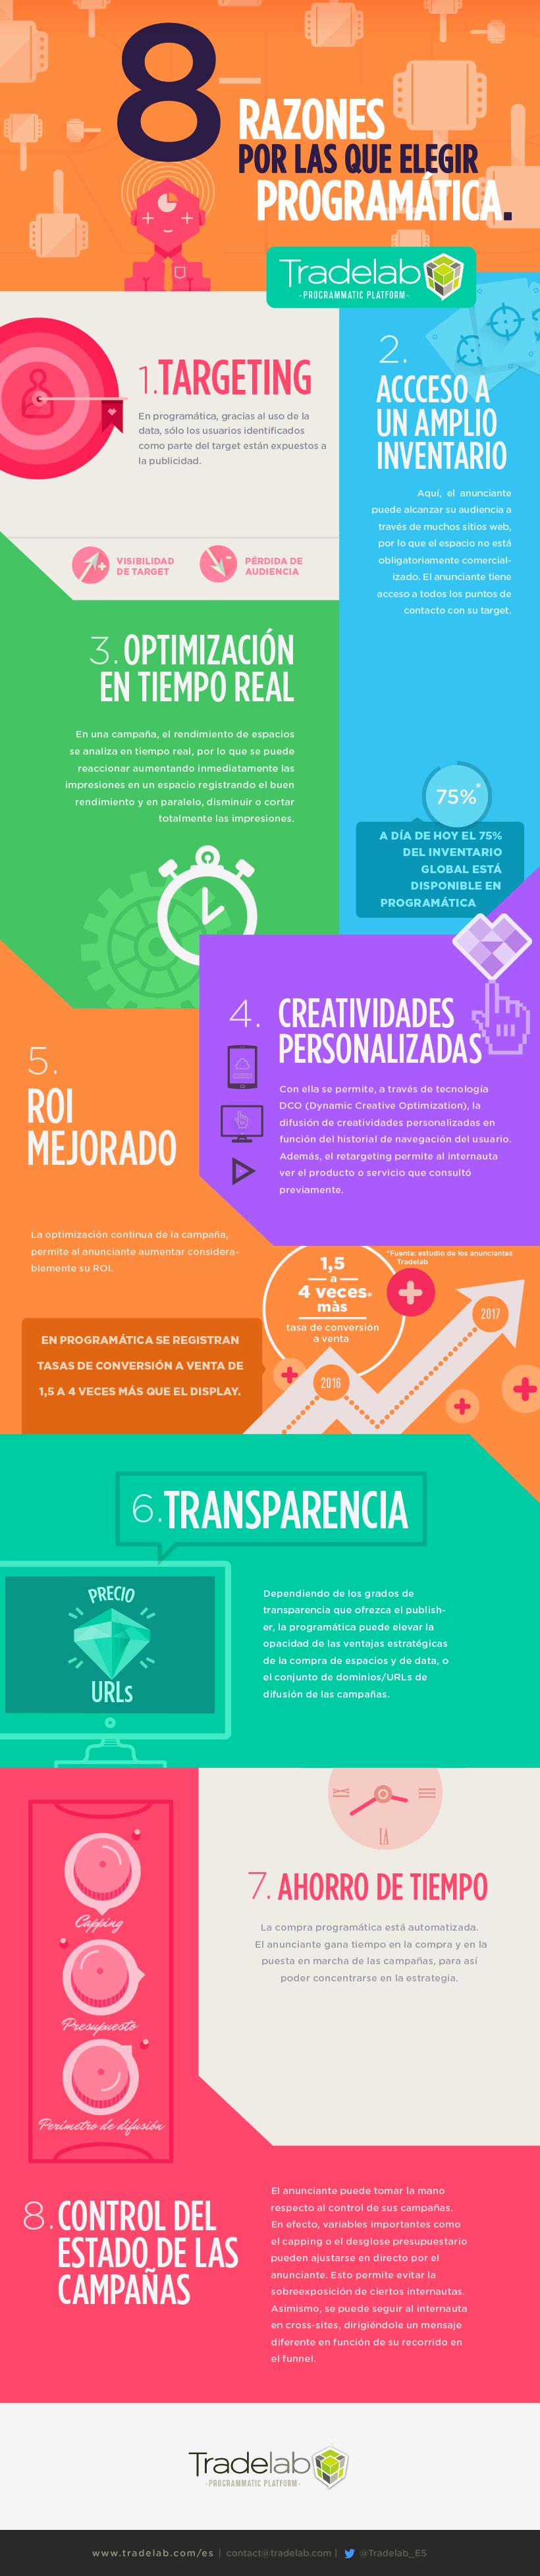 8 razones para elegir Programática #infografia #infographic #marketing